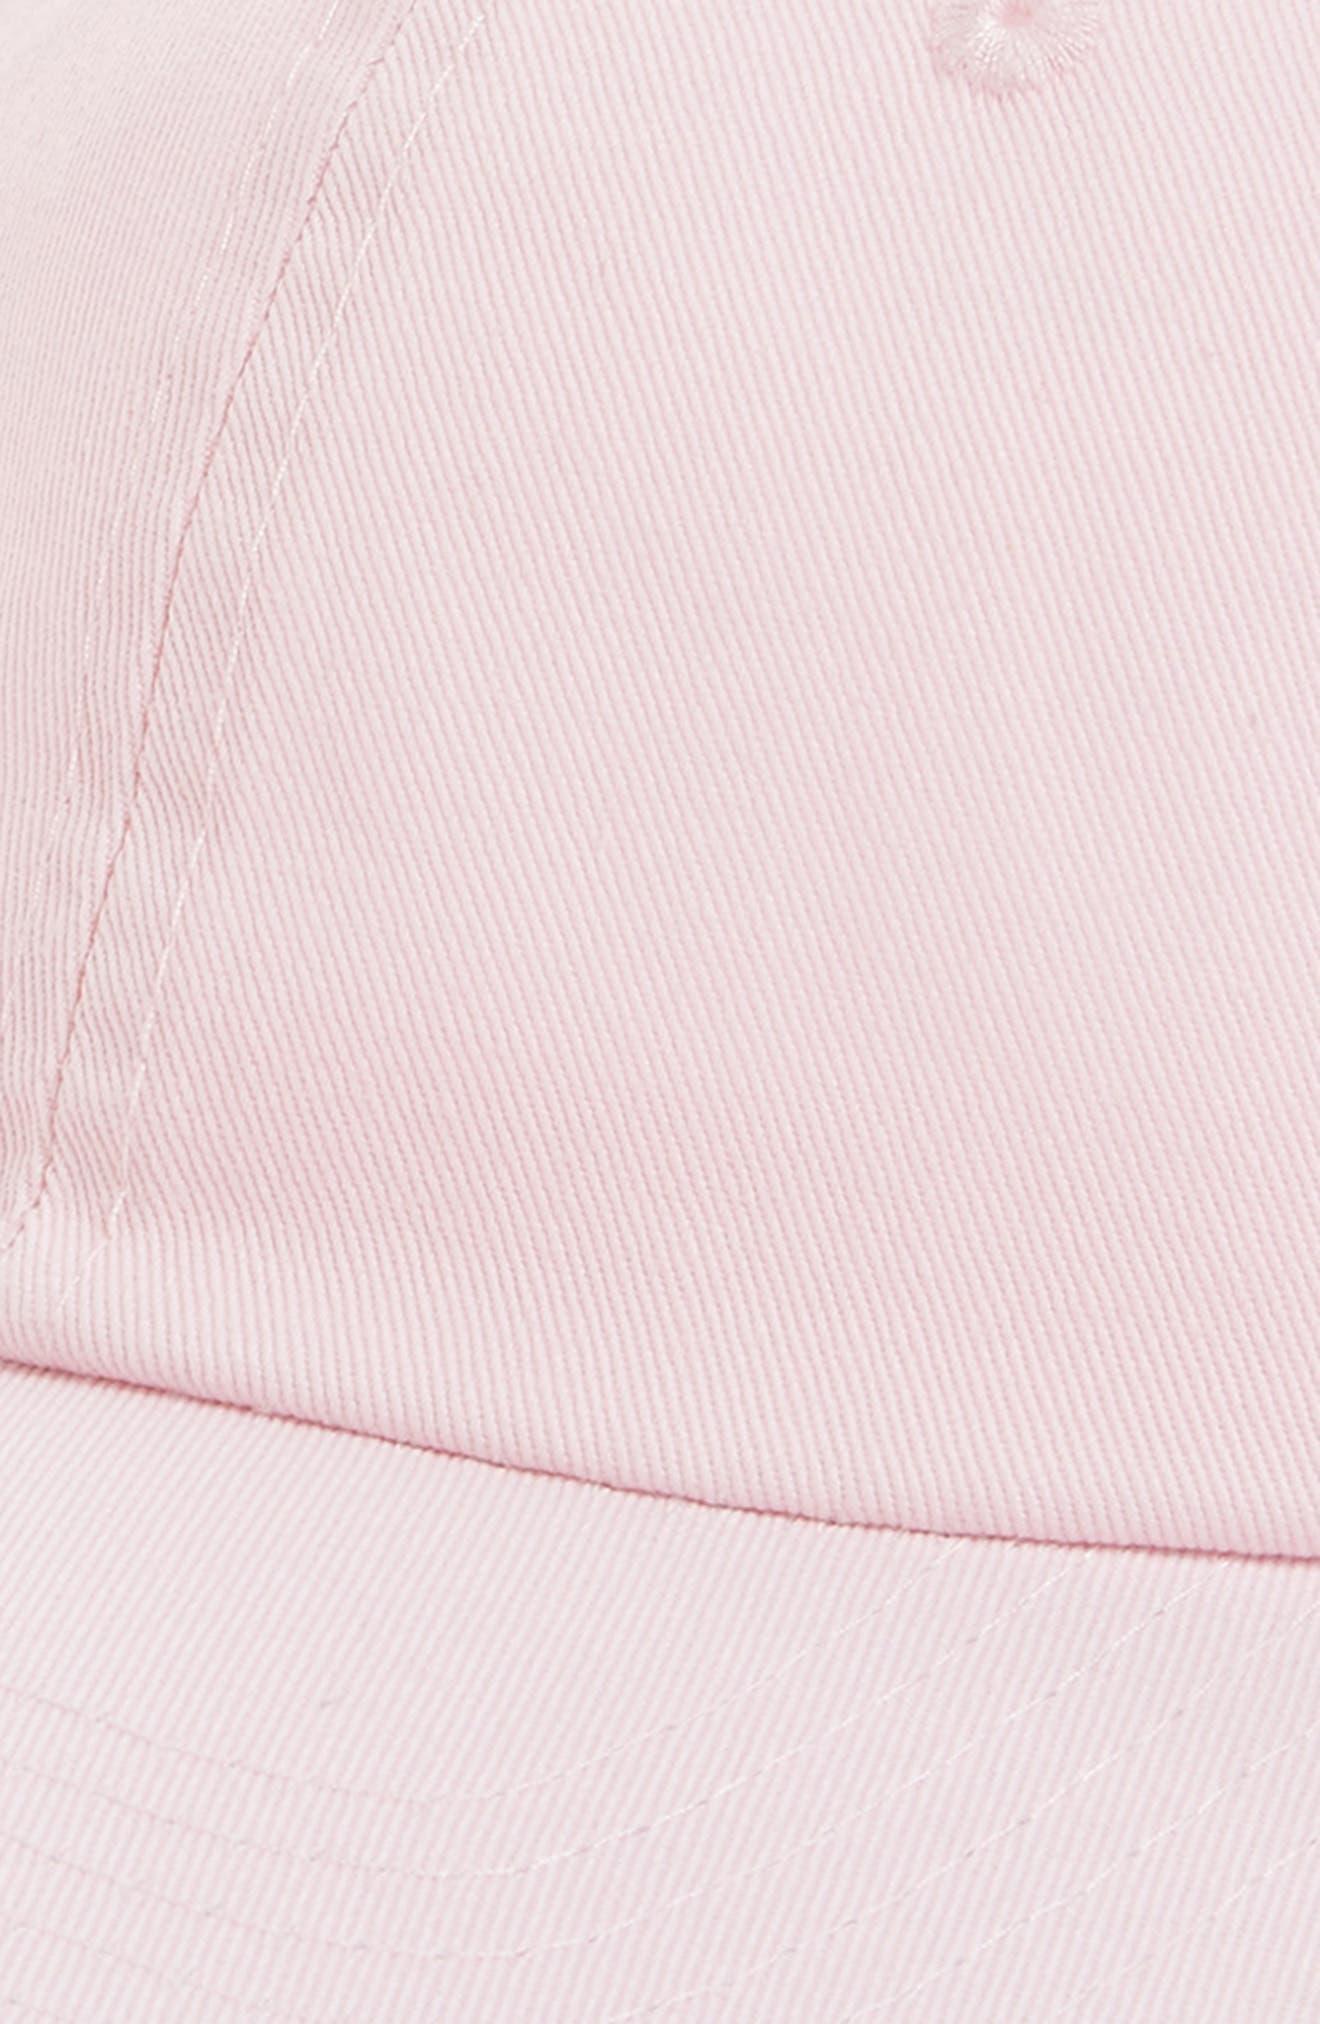 Peach Baseball Cap,                             Alternate thumbnail 3, color,                             Pink